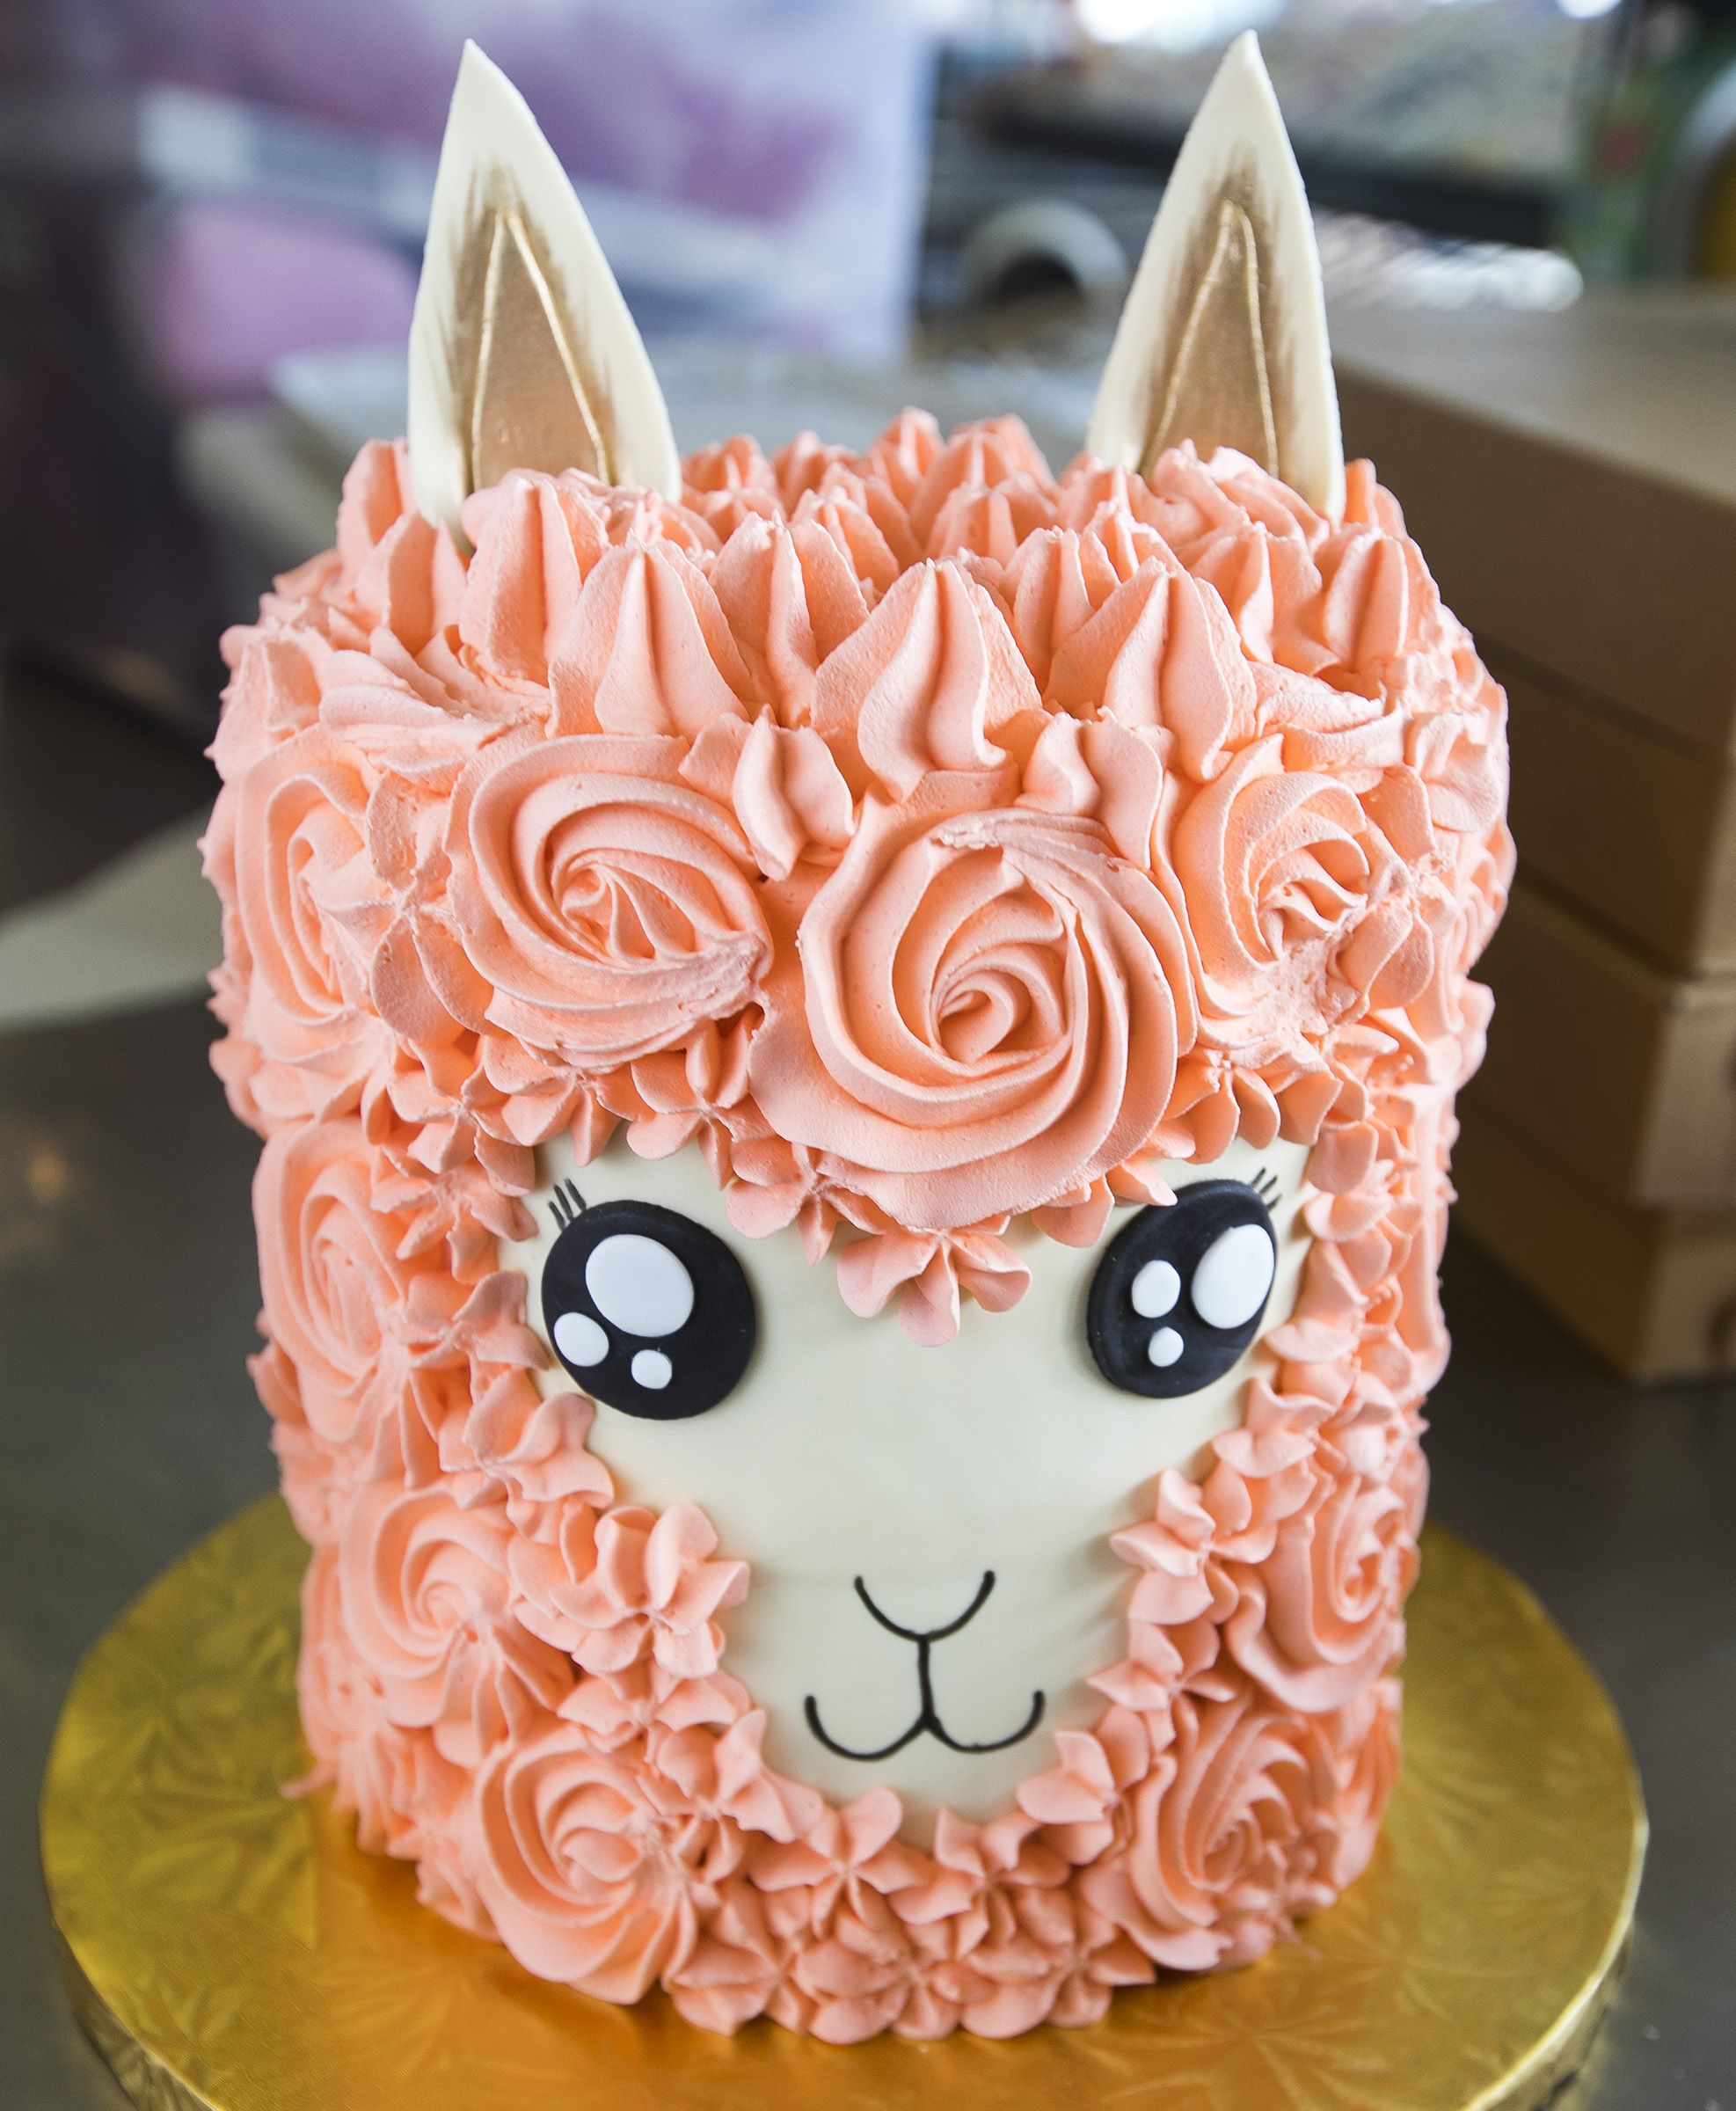 Superb Llama Cake 217 Animal Cakes Cake Decorating Designs 10 Funny Birthday Cards Online Hendilapandamsfinfo